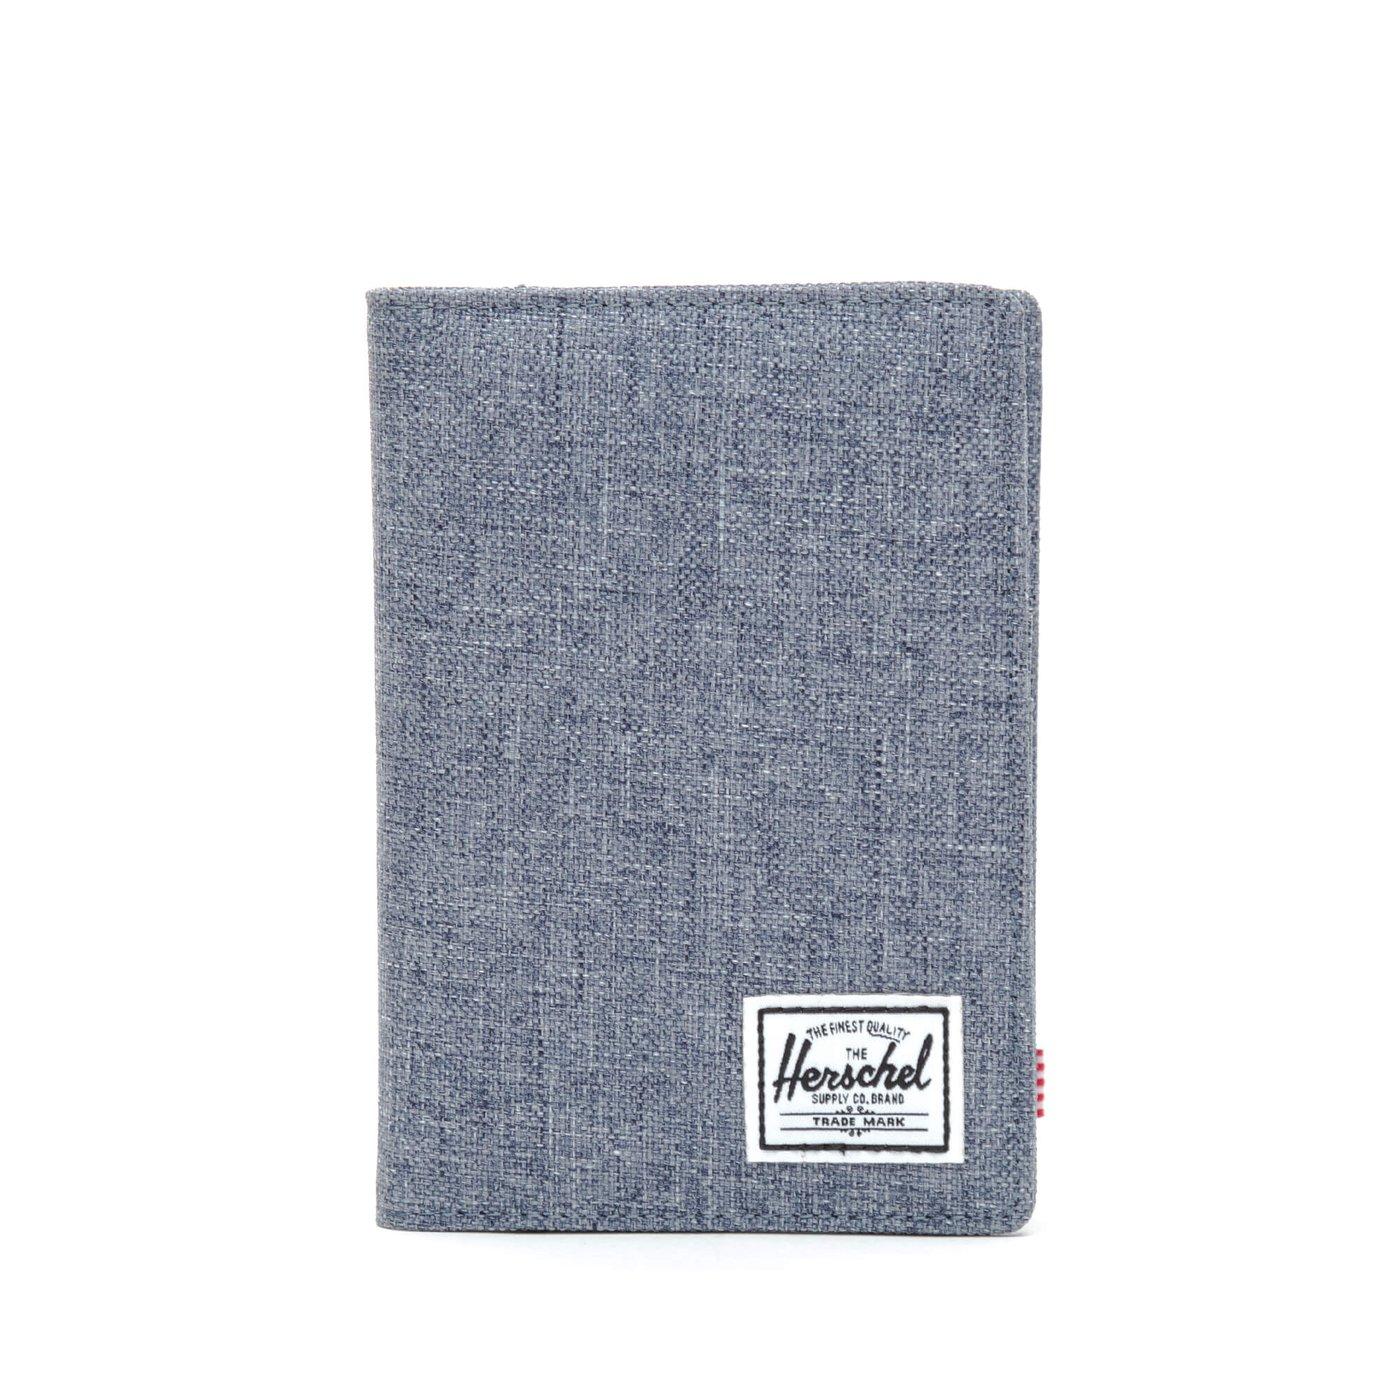 Herschel Raynor Passport Holder Rfıd Unisex Gri Çanta